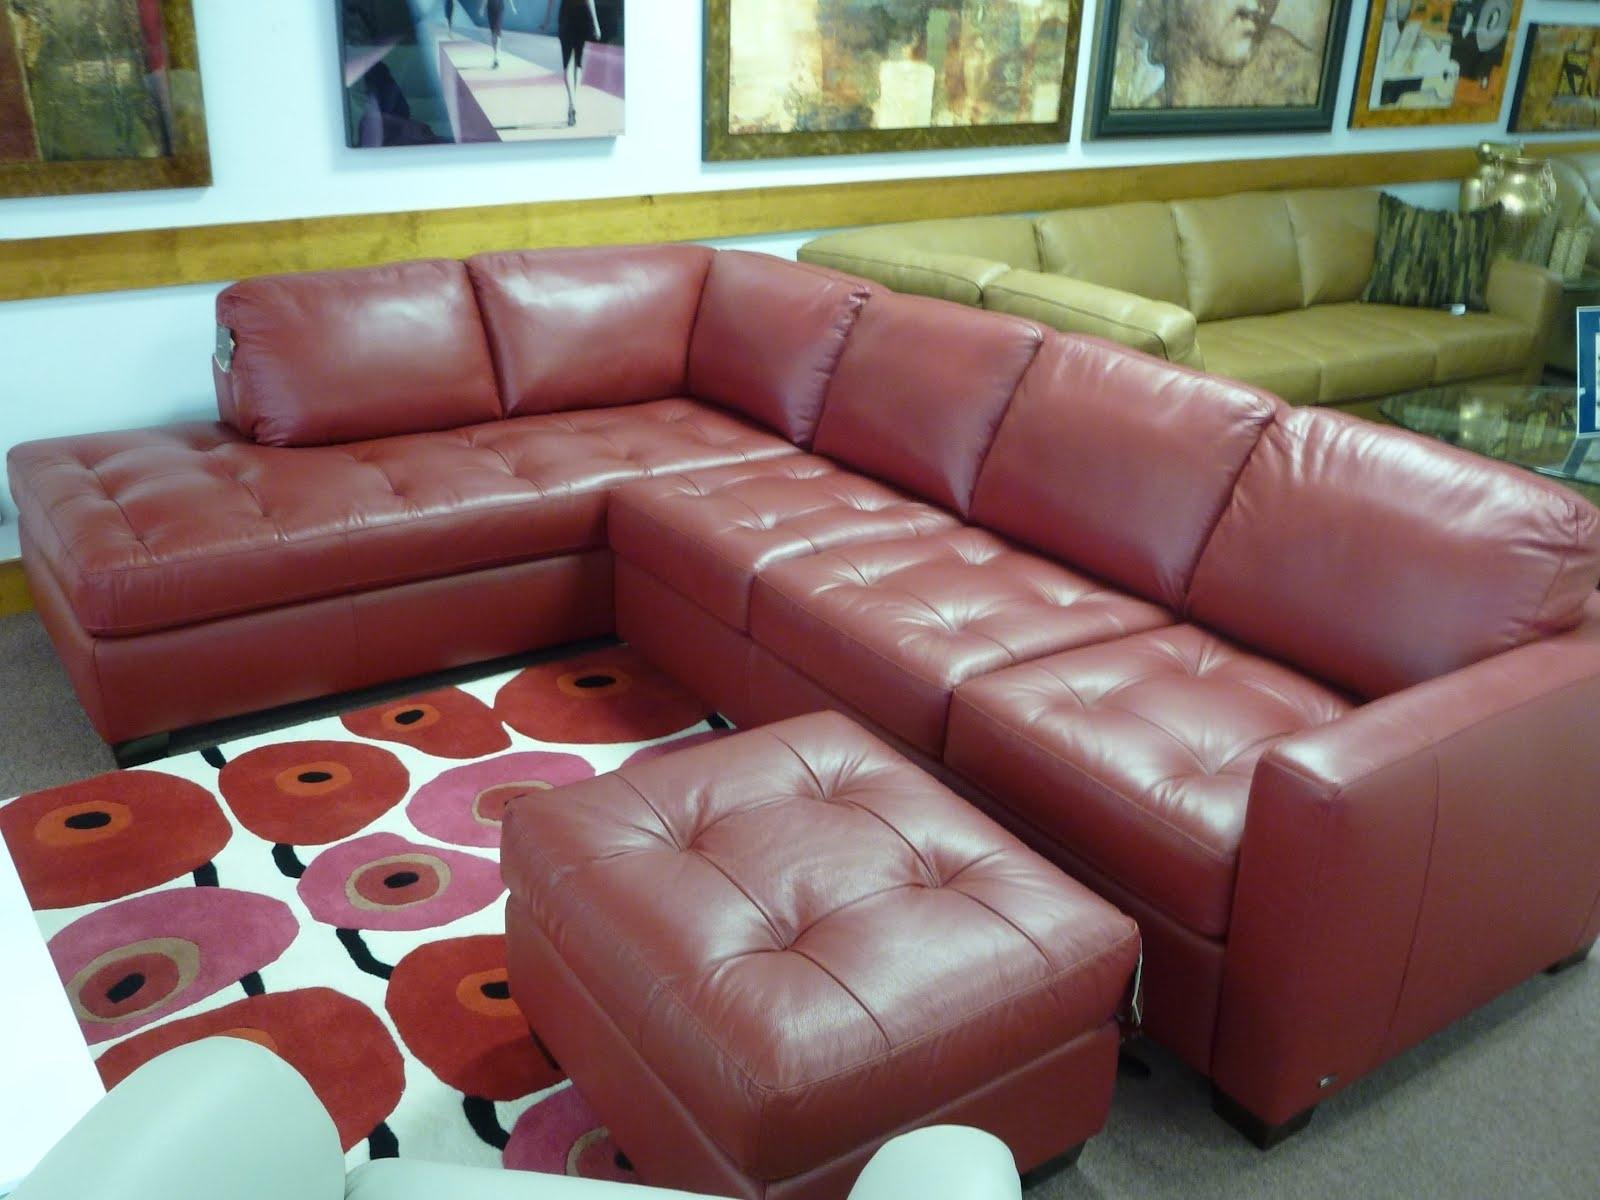 Sectional Sofa Design: Wonderful Natuzzi Leather Sectional Sofa Within Fashionable Red Leather Sectionals With Ottoman (View 13 of 15)